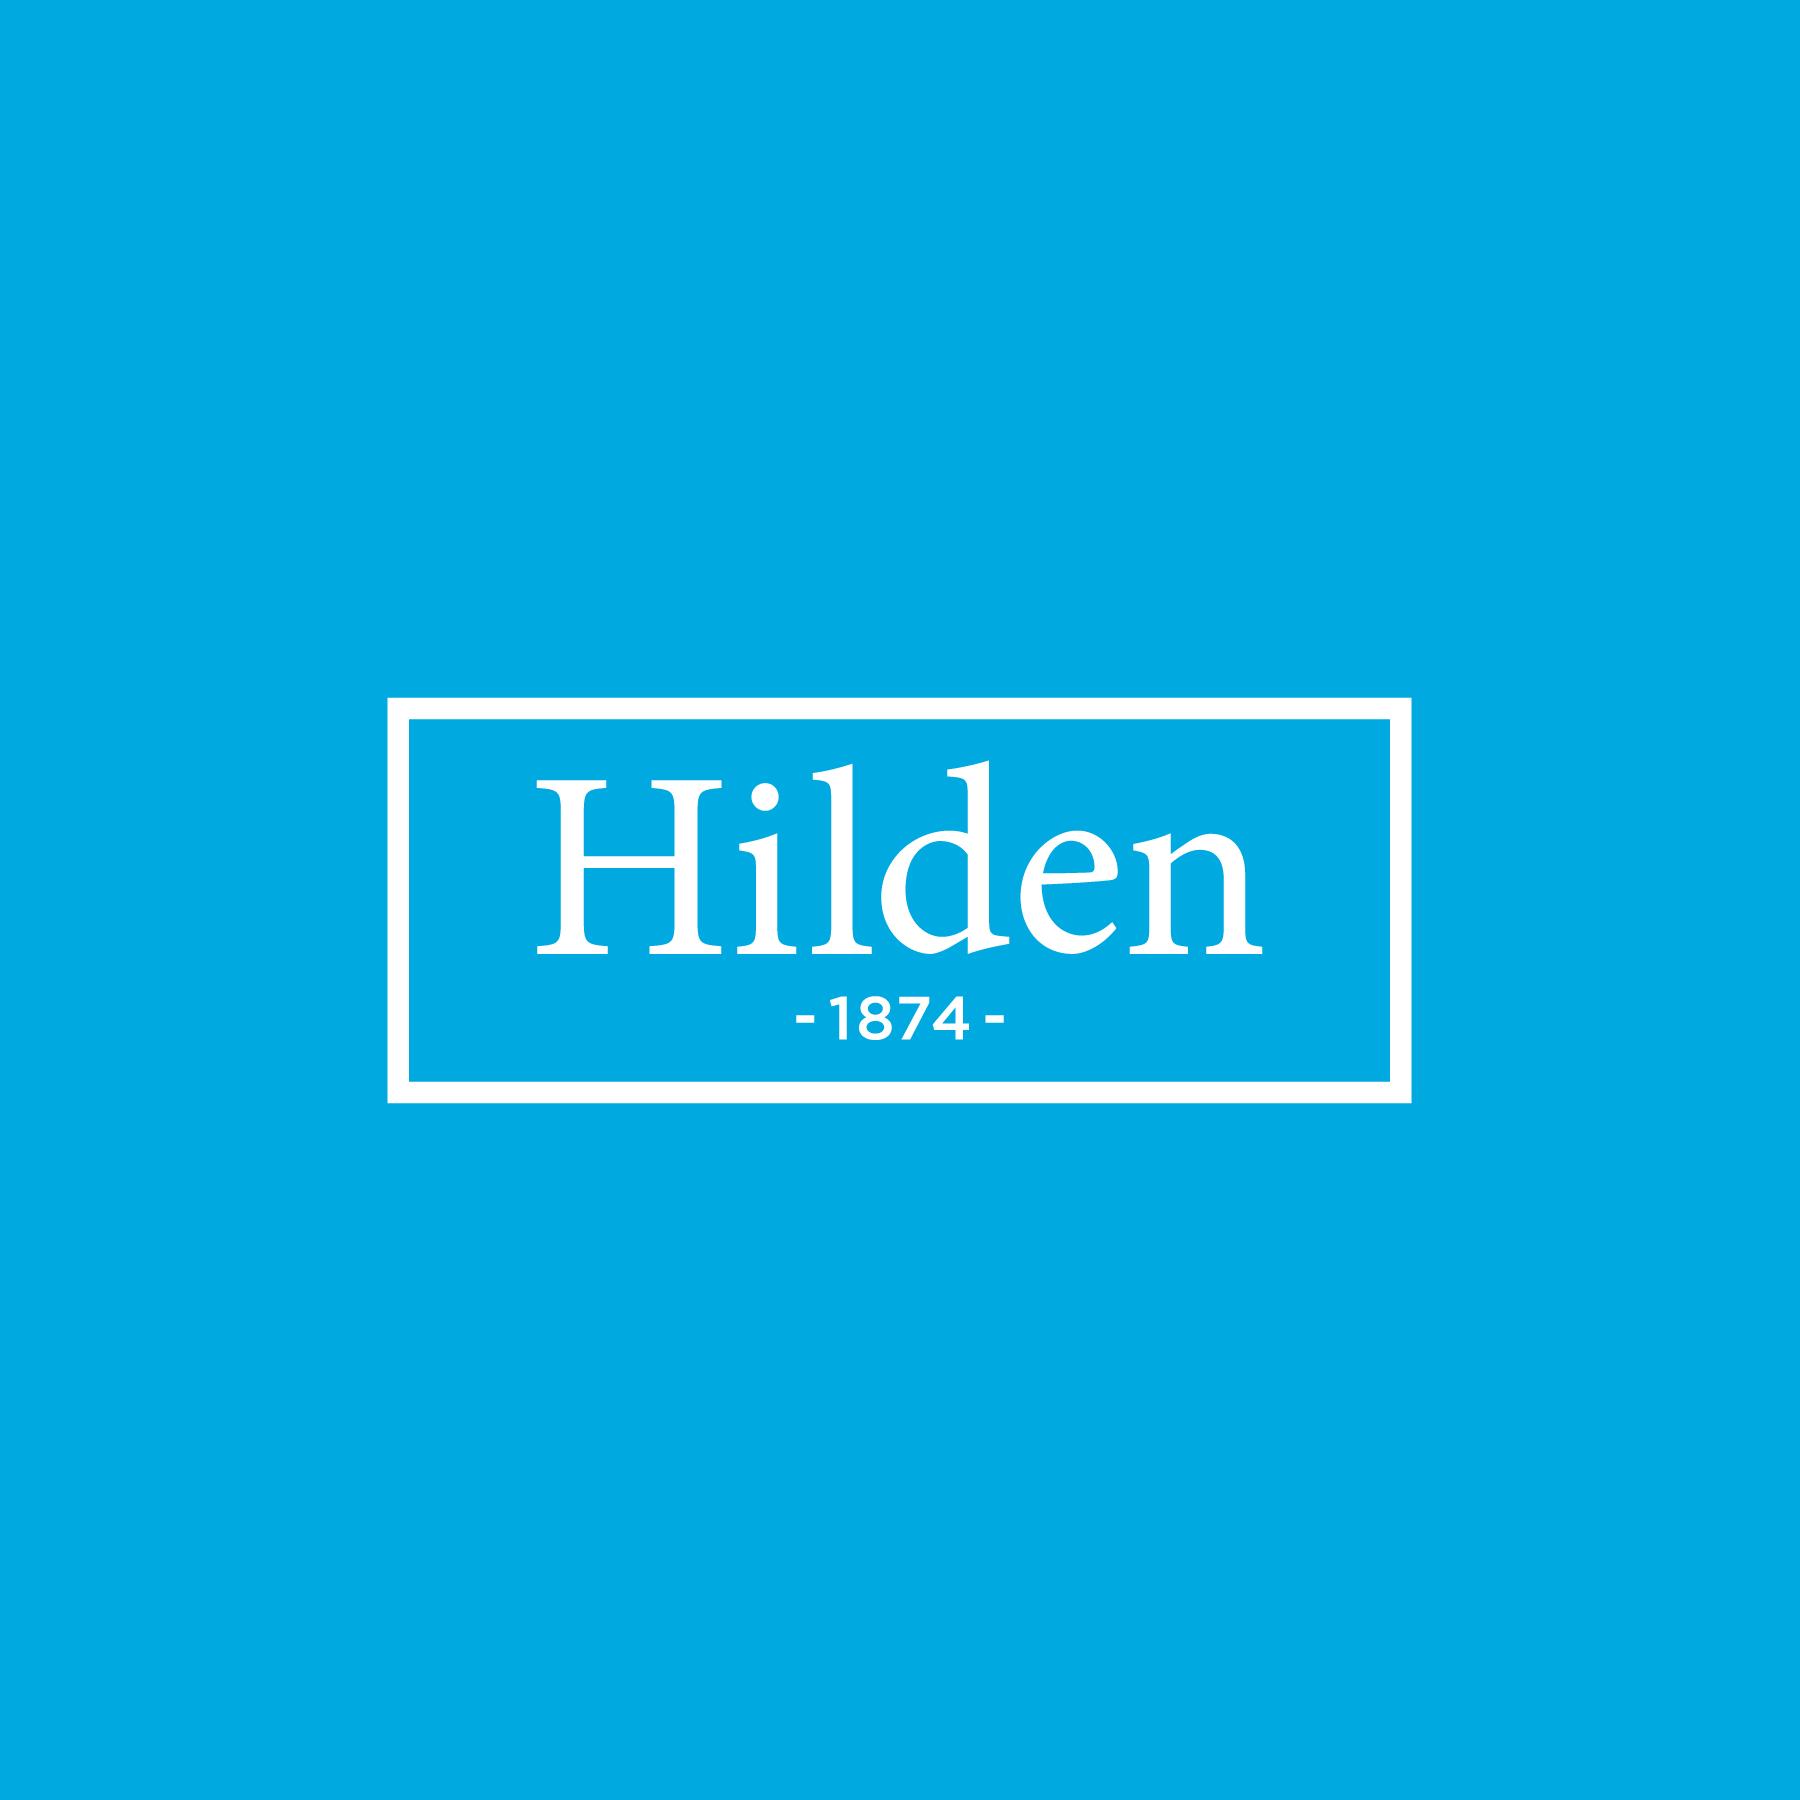 View Hilden Brand Collection Details